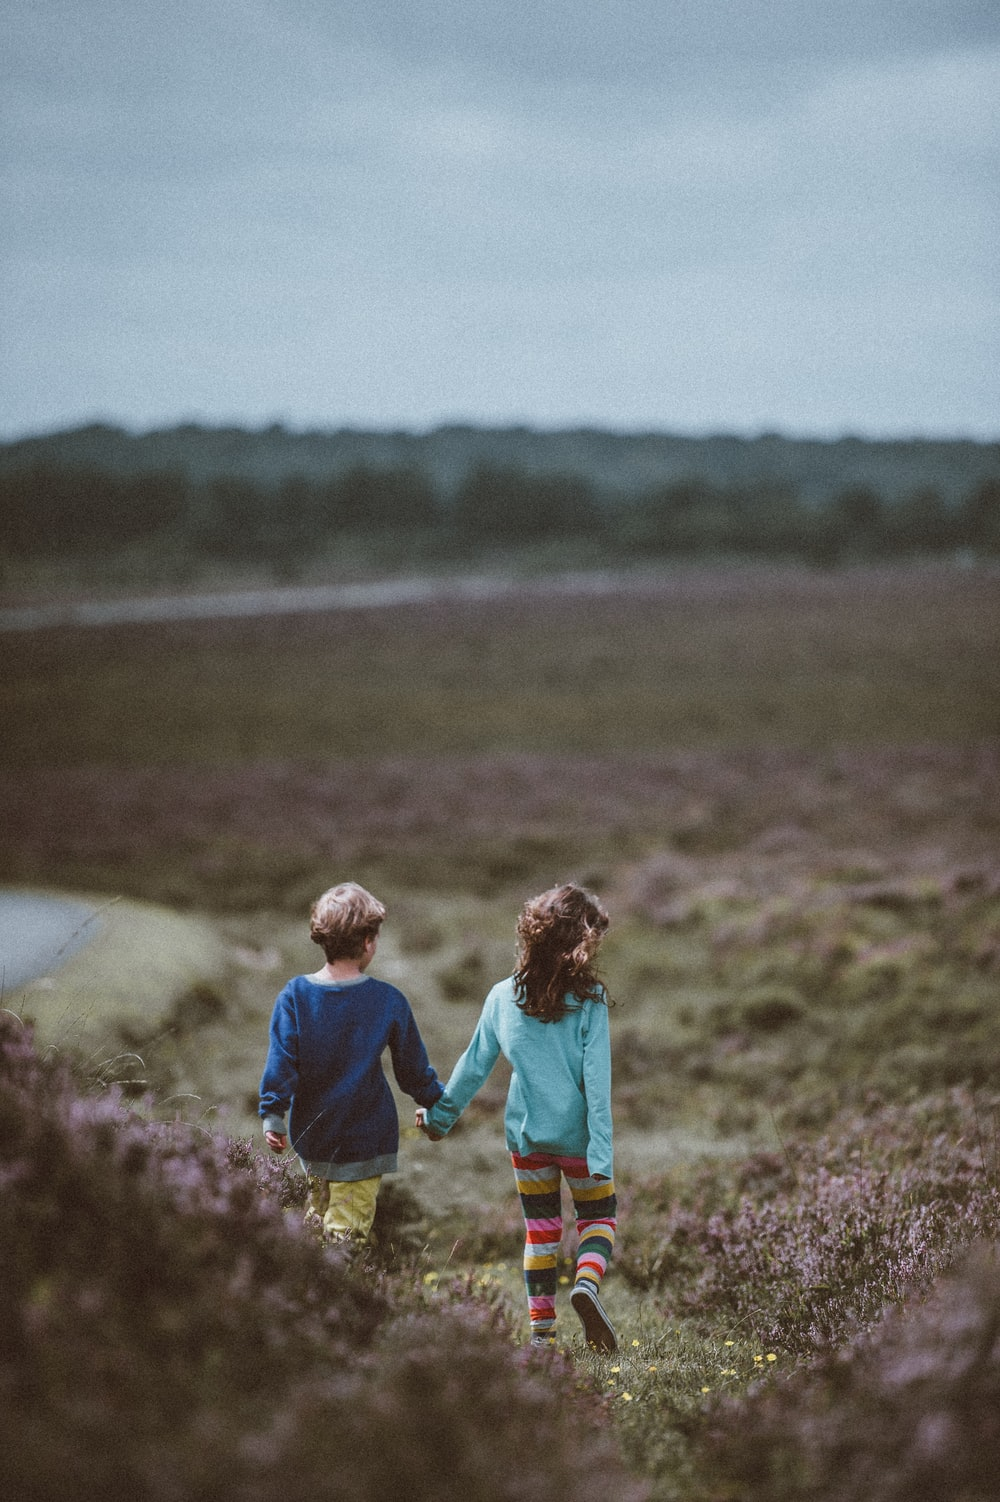 children waling downhill